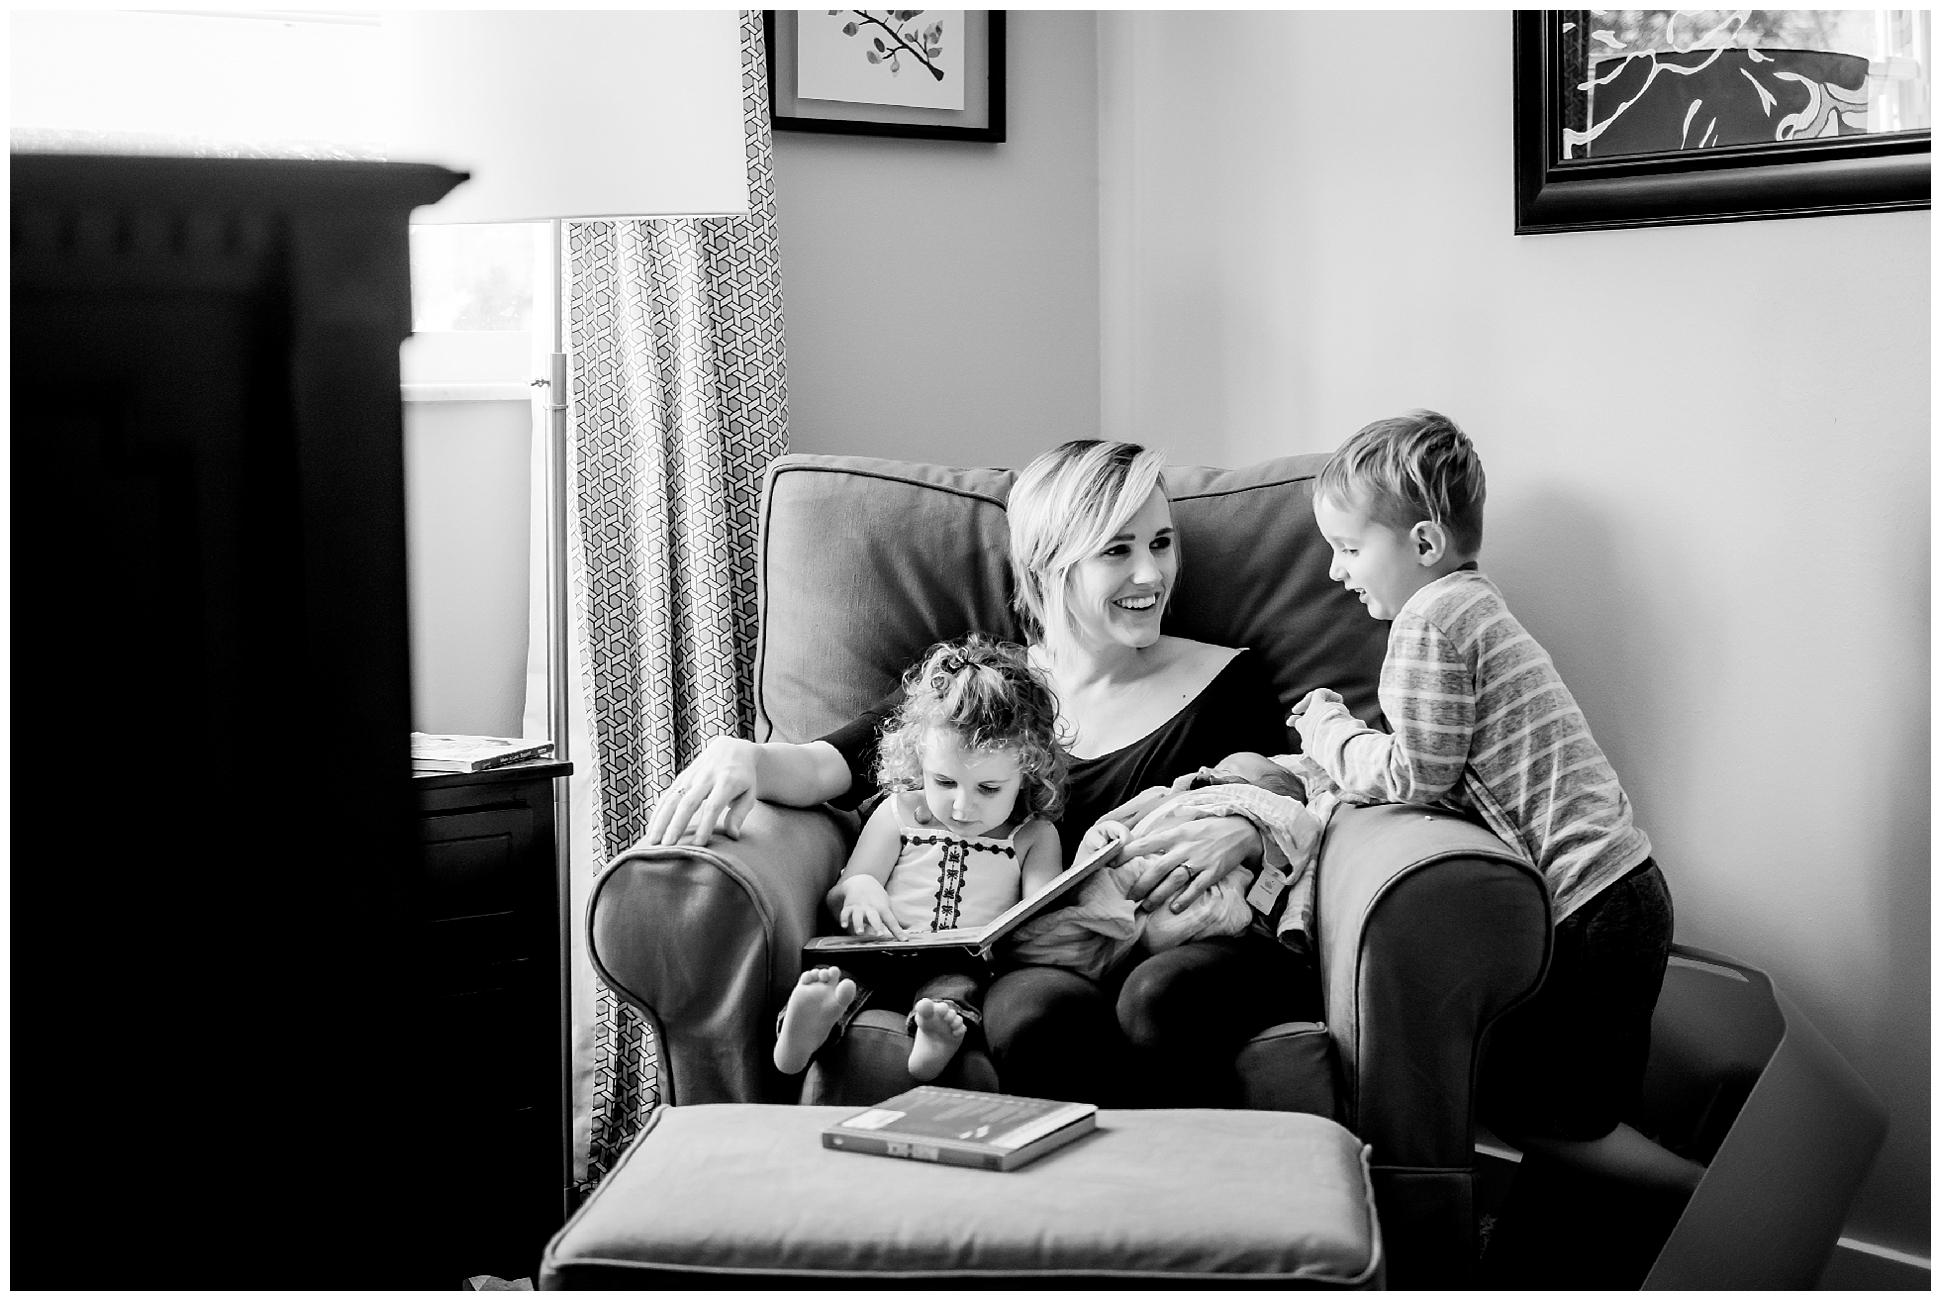 tampa-lifestyle-portrait-photographer-in-home-pentax-film-vs-digital_0031.jpg